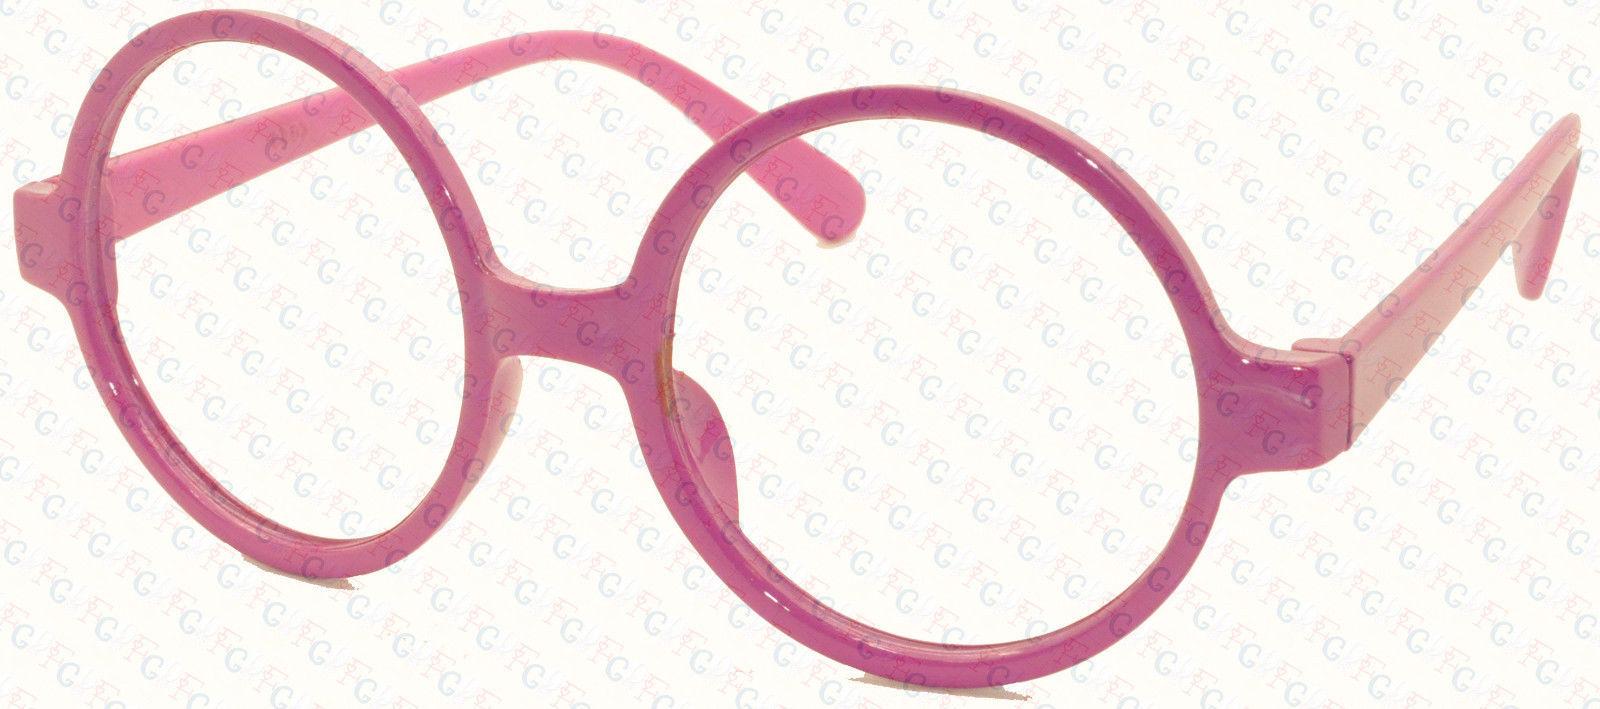 Vintage Retro Geek Nerd Style Round Shape Glass Frame NO LENS Costume Cosplay image 4